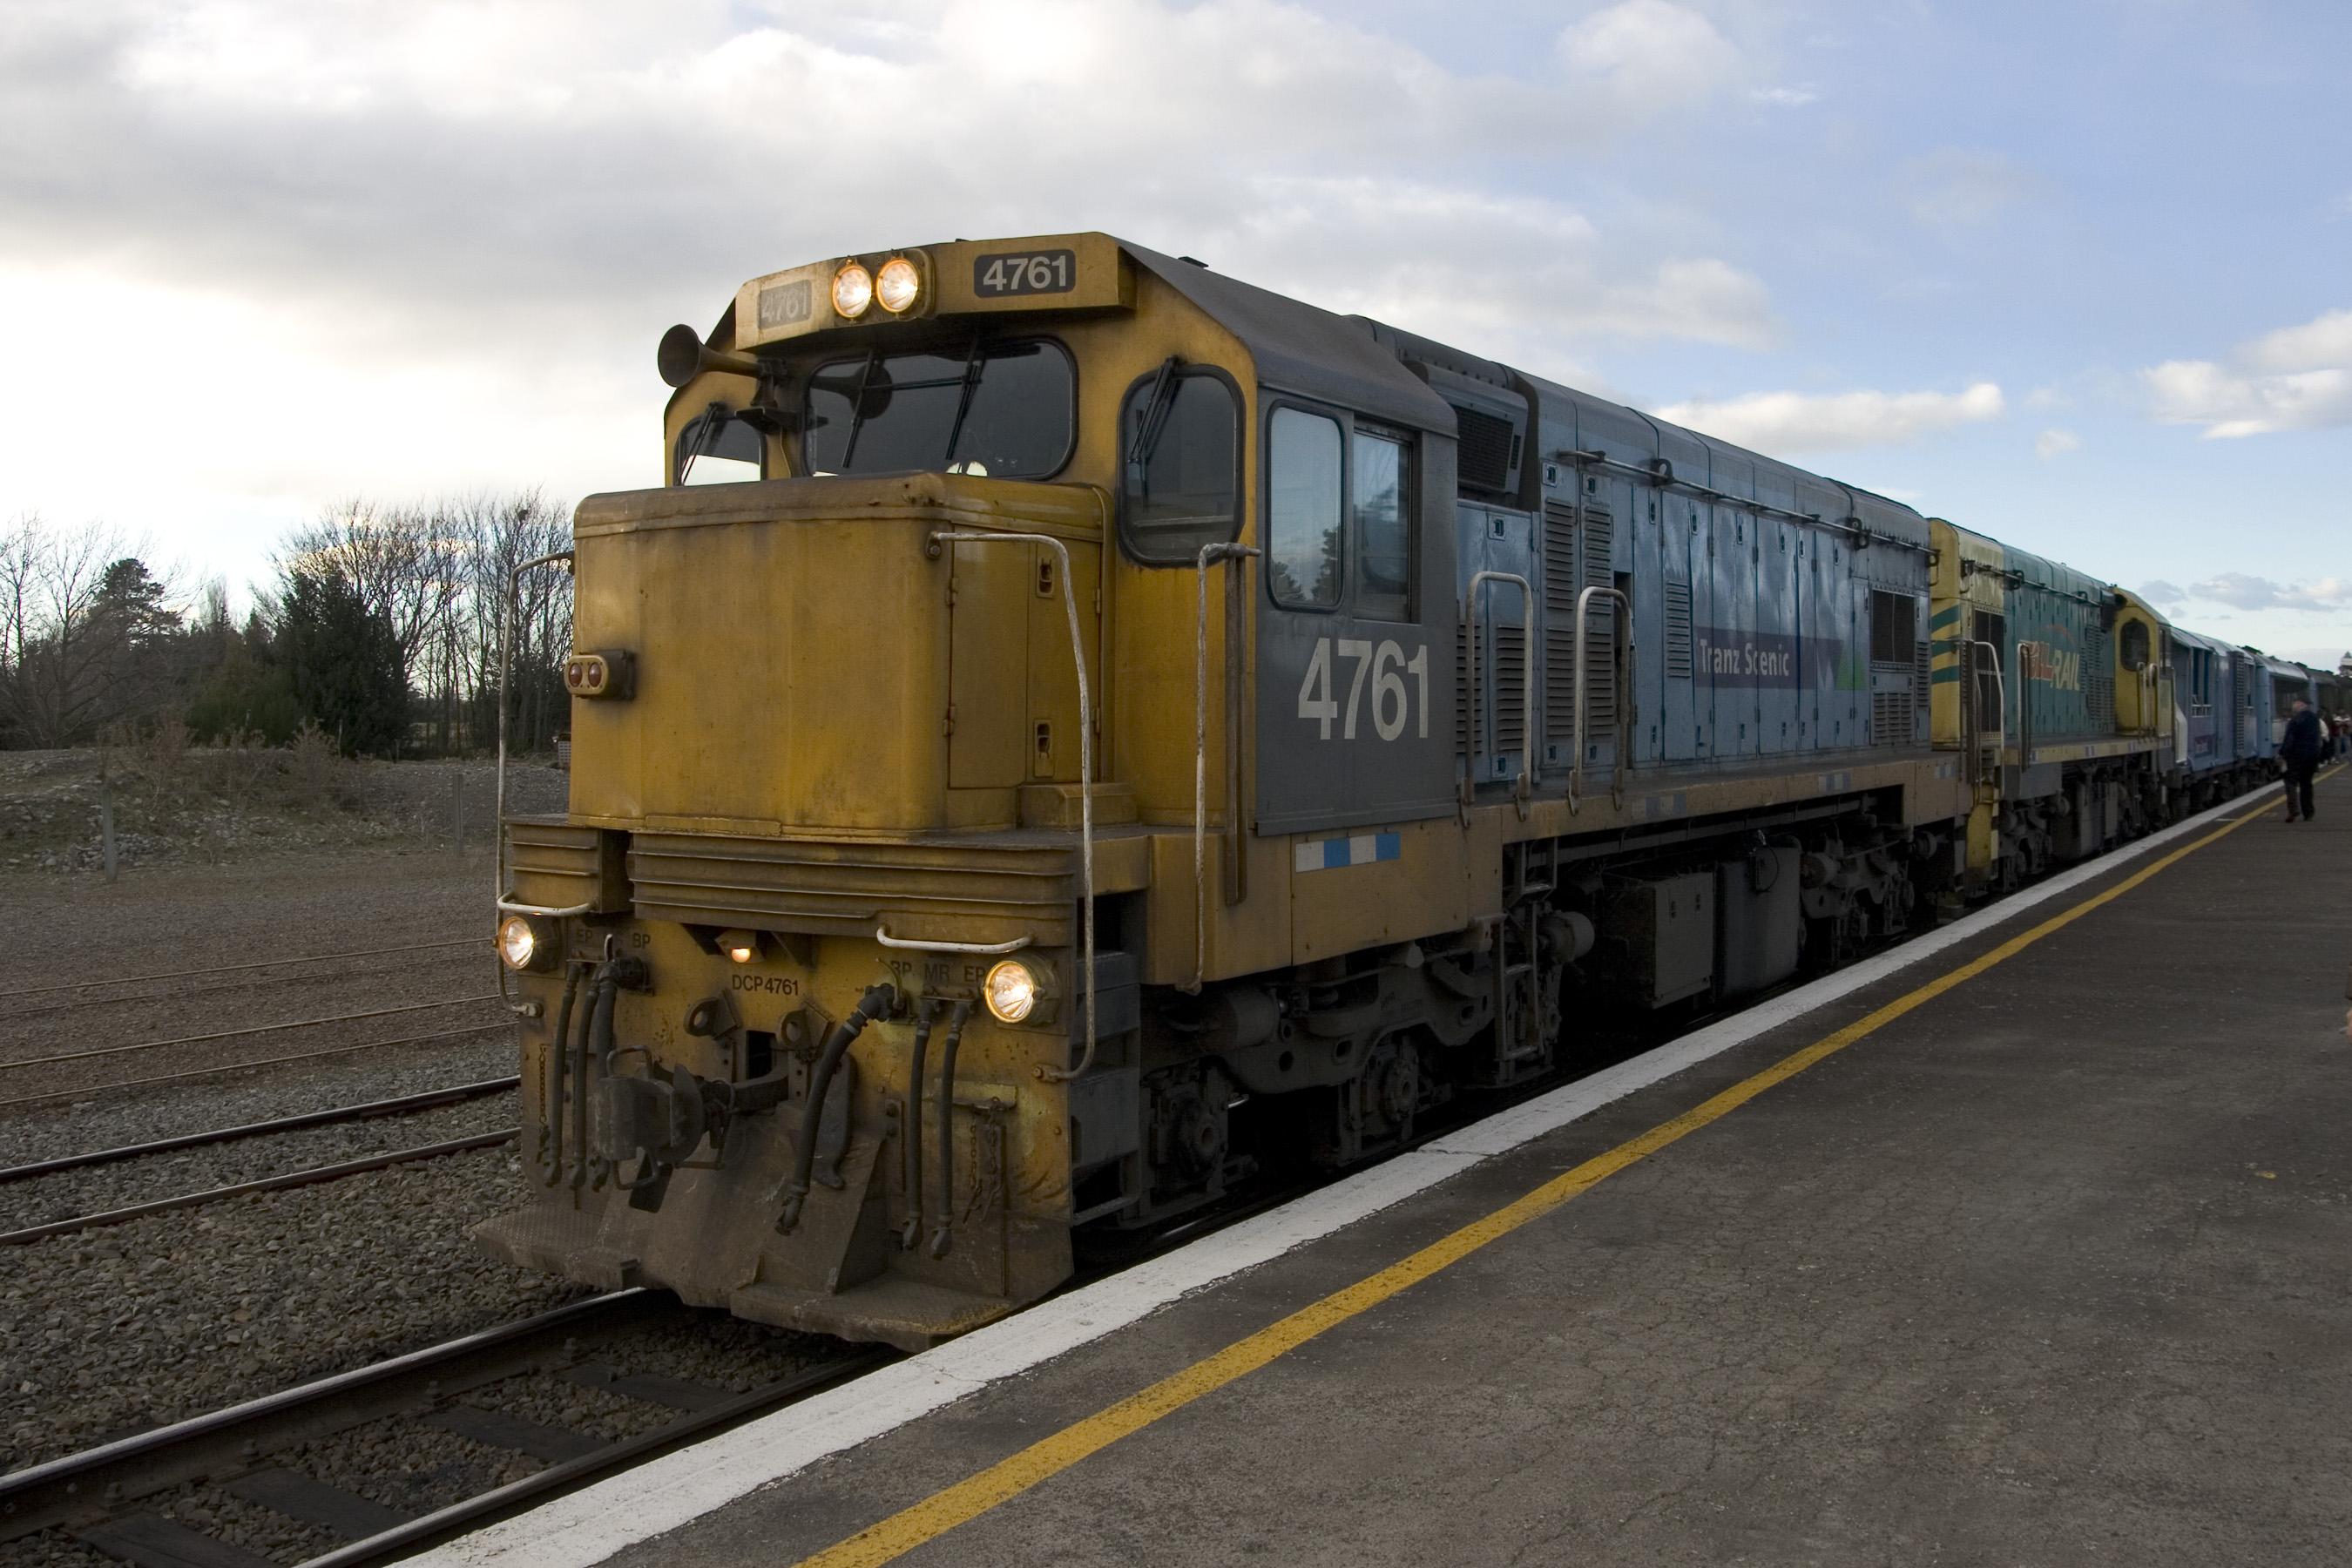 Tranz_Scenic_Locomotive_4761.jpg